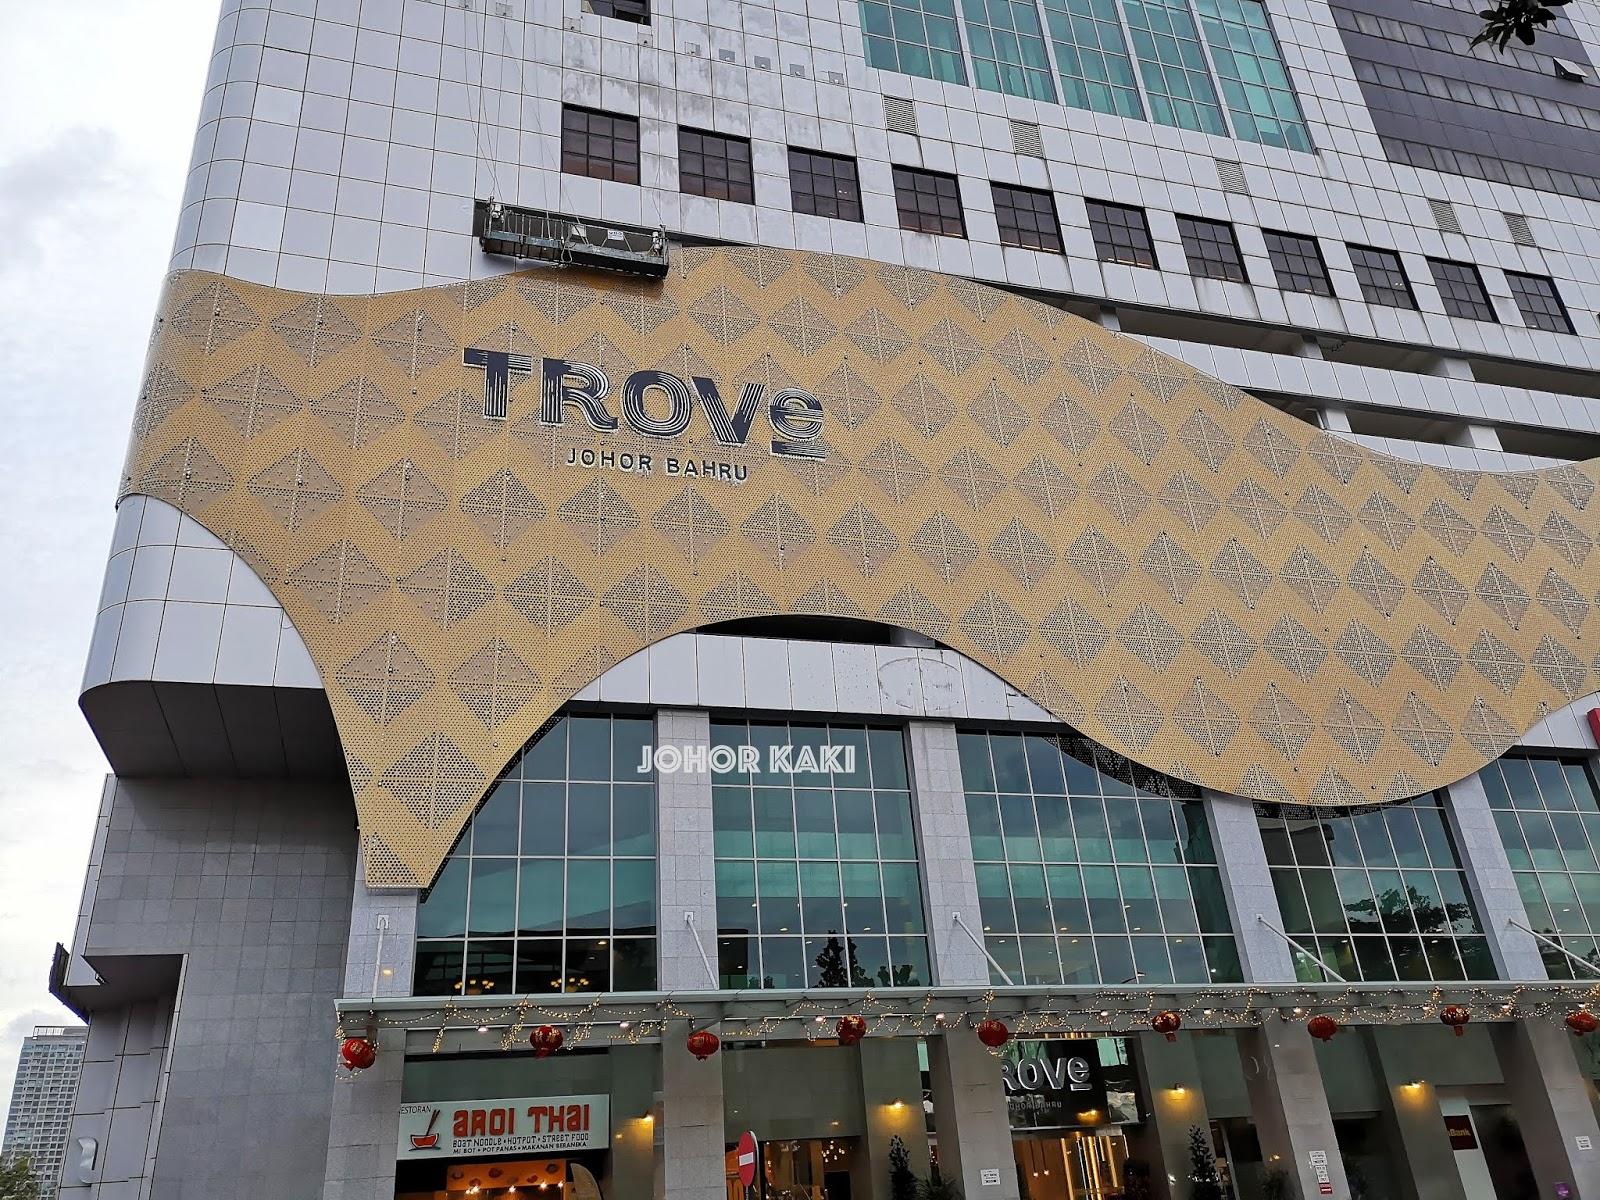 Trove Hotel Johor Bahru Near Jb Ciq Johor Kaki Travels For Food